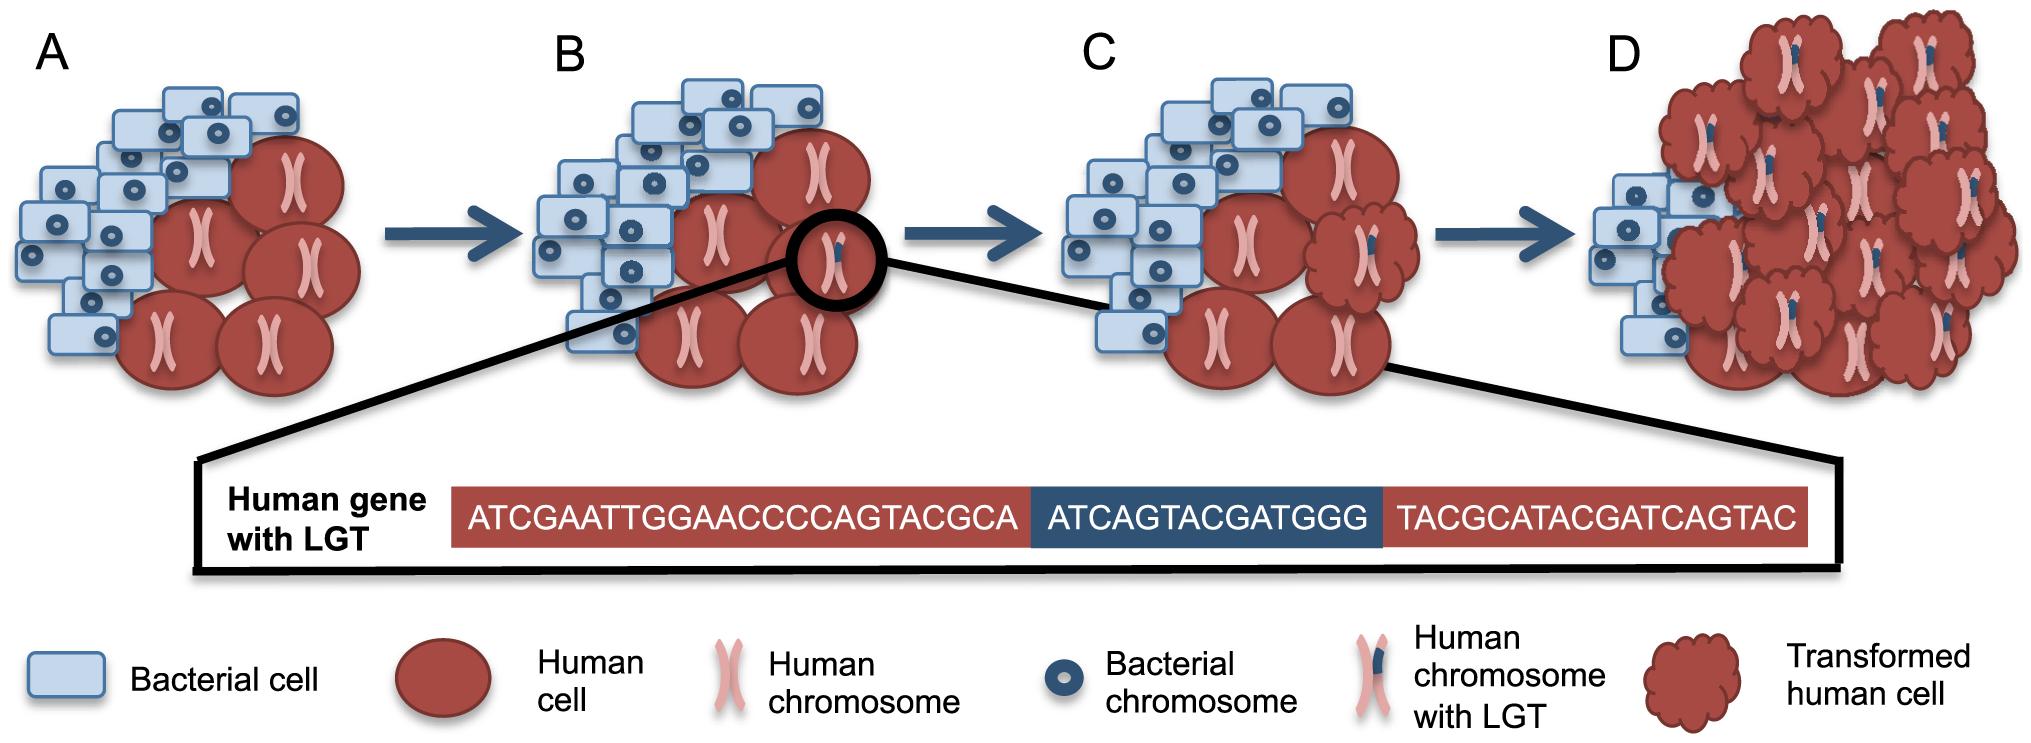 A scenario for bacteria-human LGT and carcinogenesis.